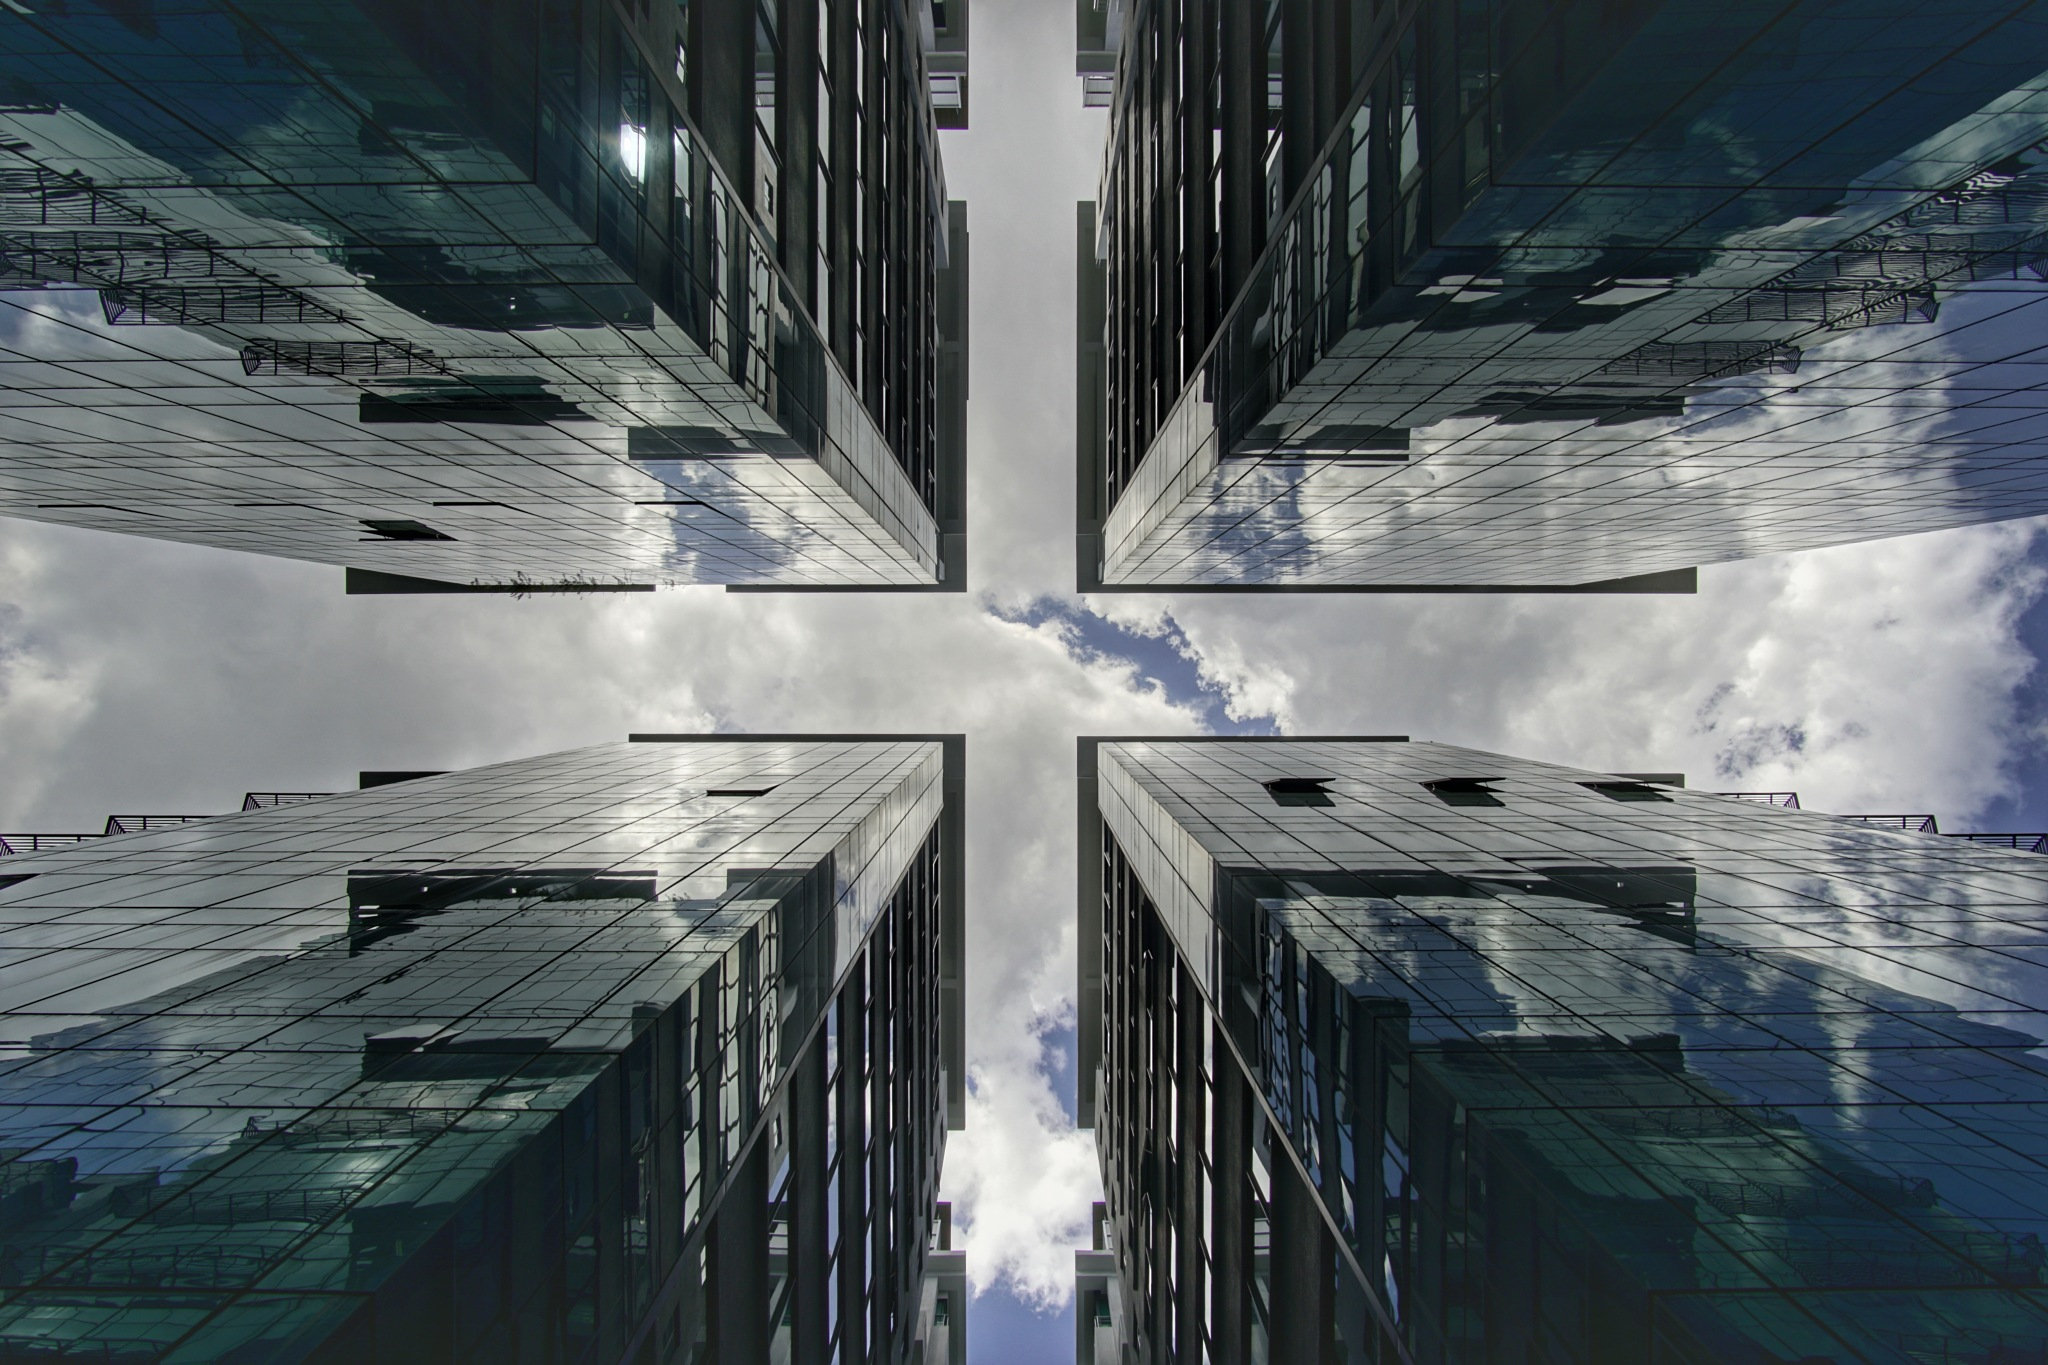 The 4 Towers by Mohd Arrazi Rosdi